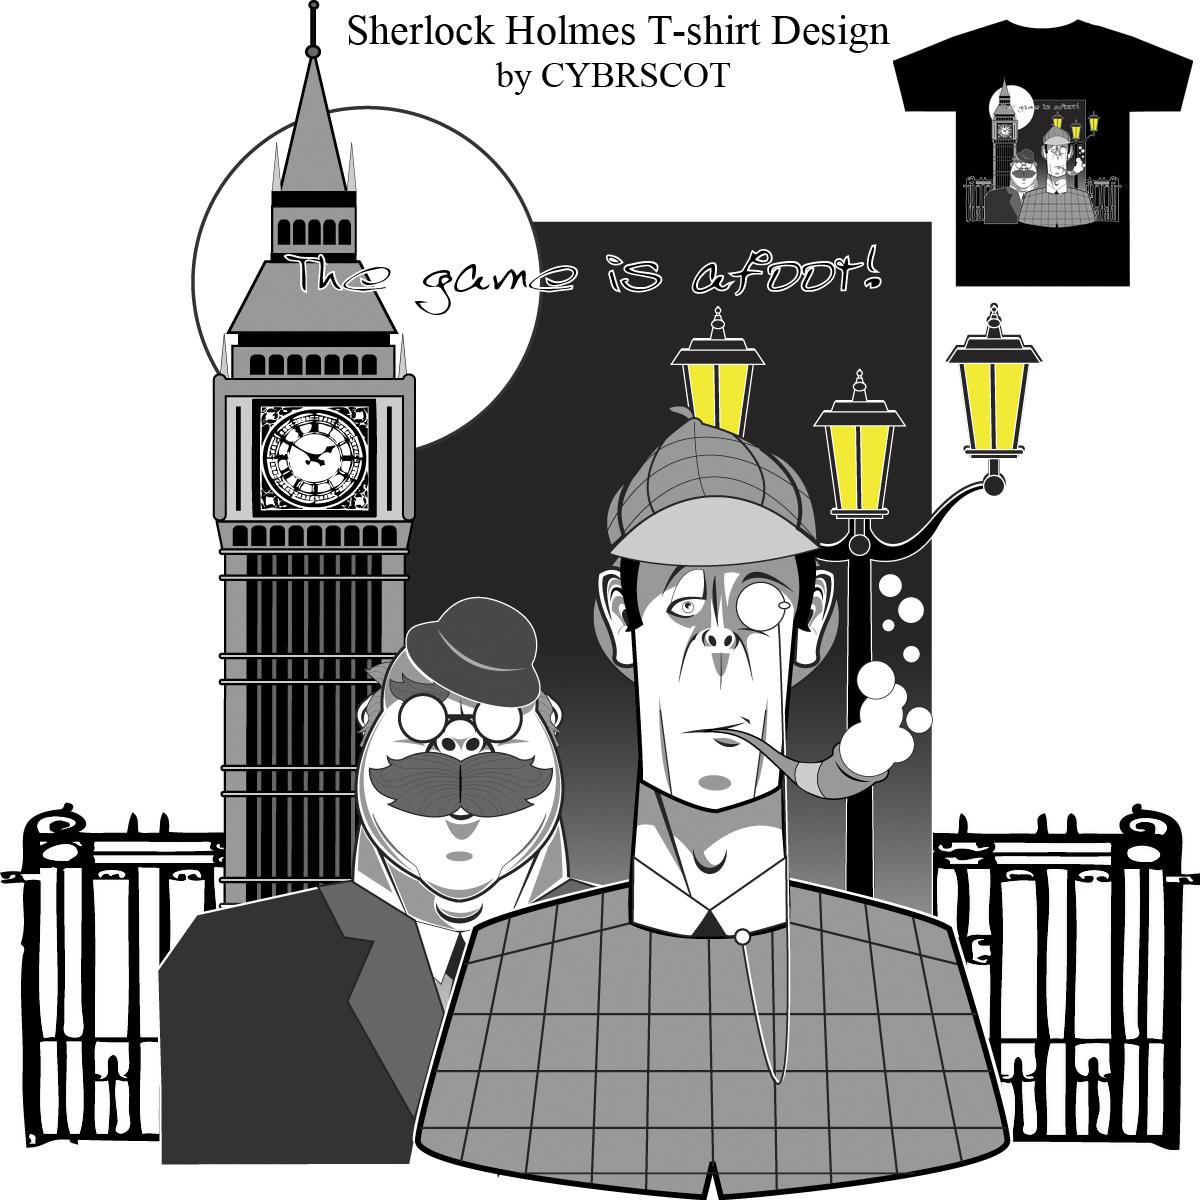 Holmes & Watson by CYBRSCOT on Threadless